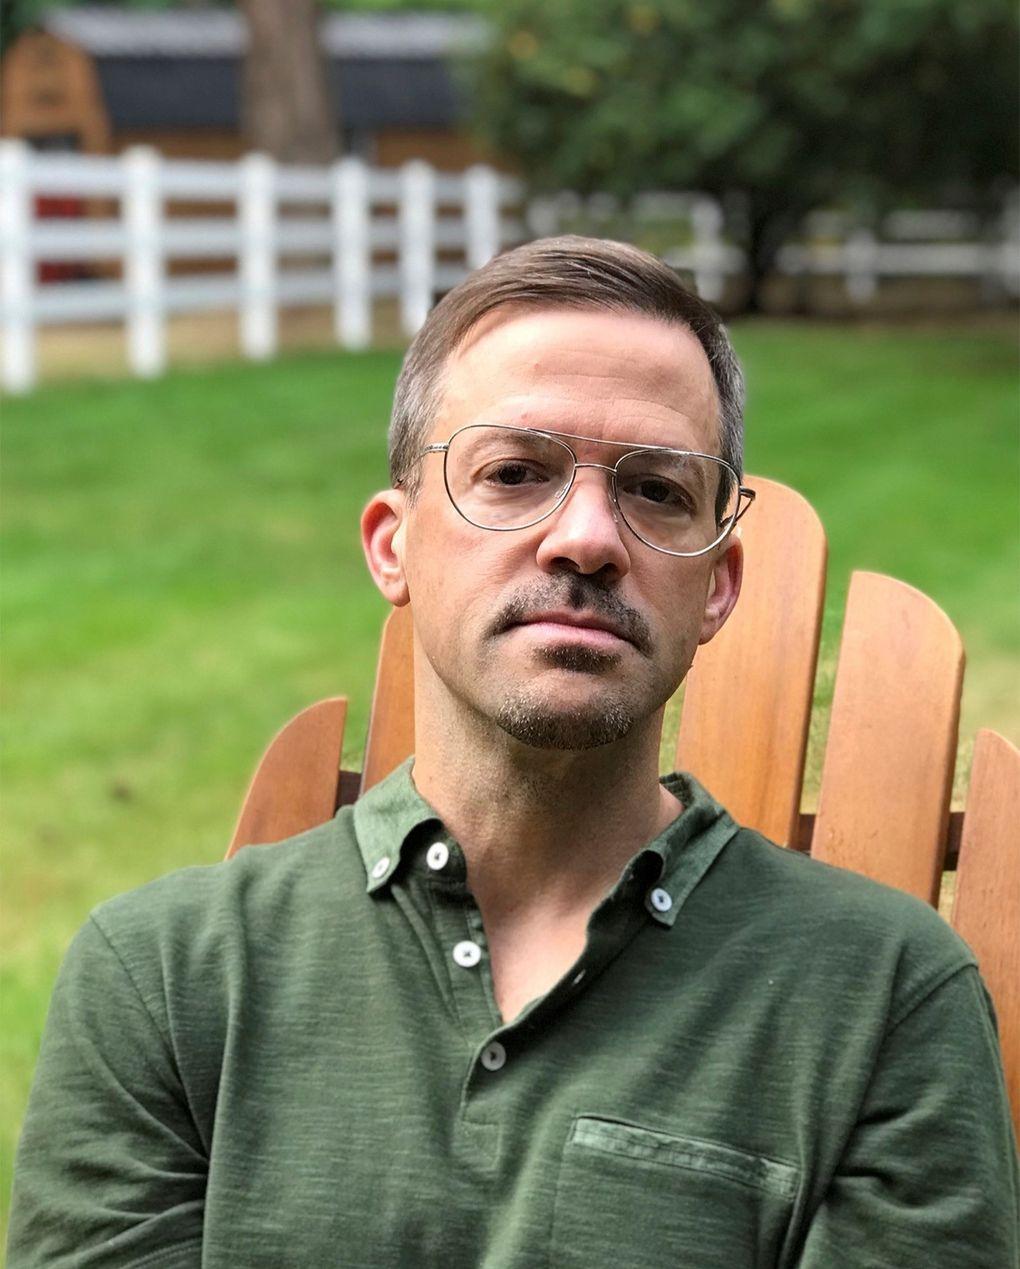 Bellevue-based screenwriter and producer Jonathan Keasey. (Brad Wilke)